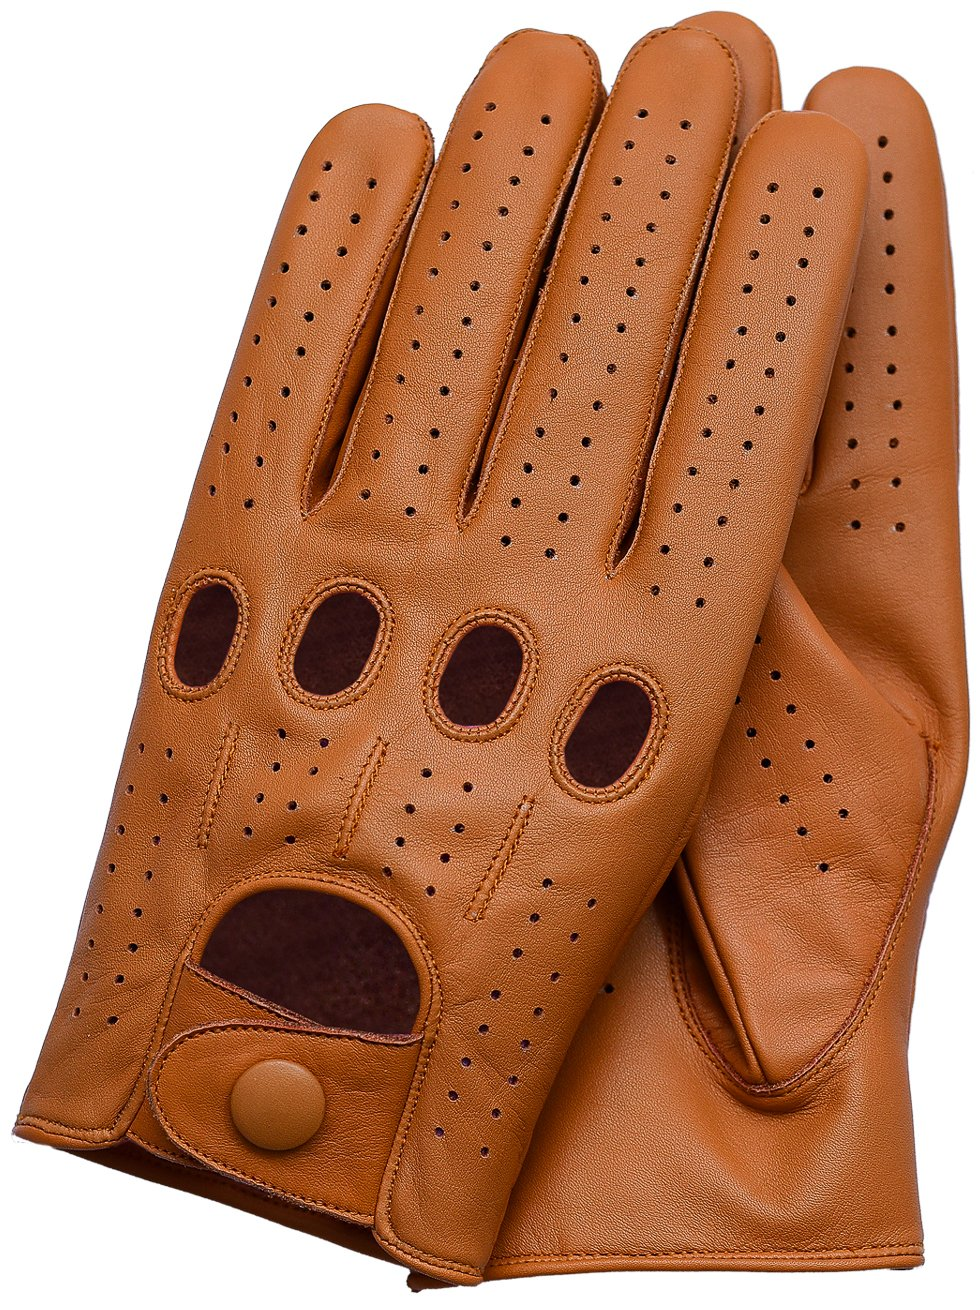 Riparo Genuine Leather Driving Gloves (Large, Tan)